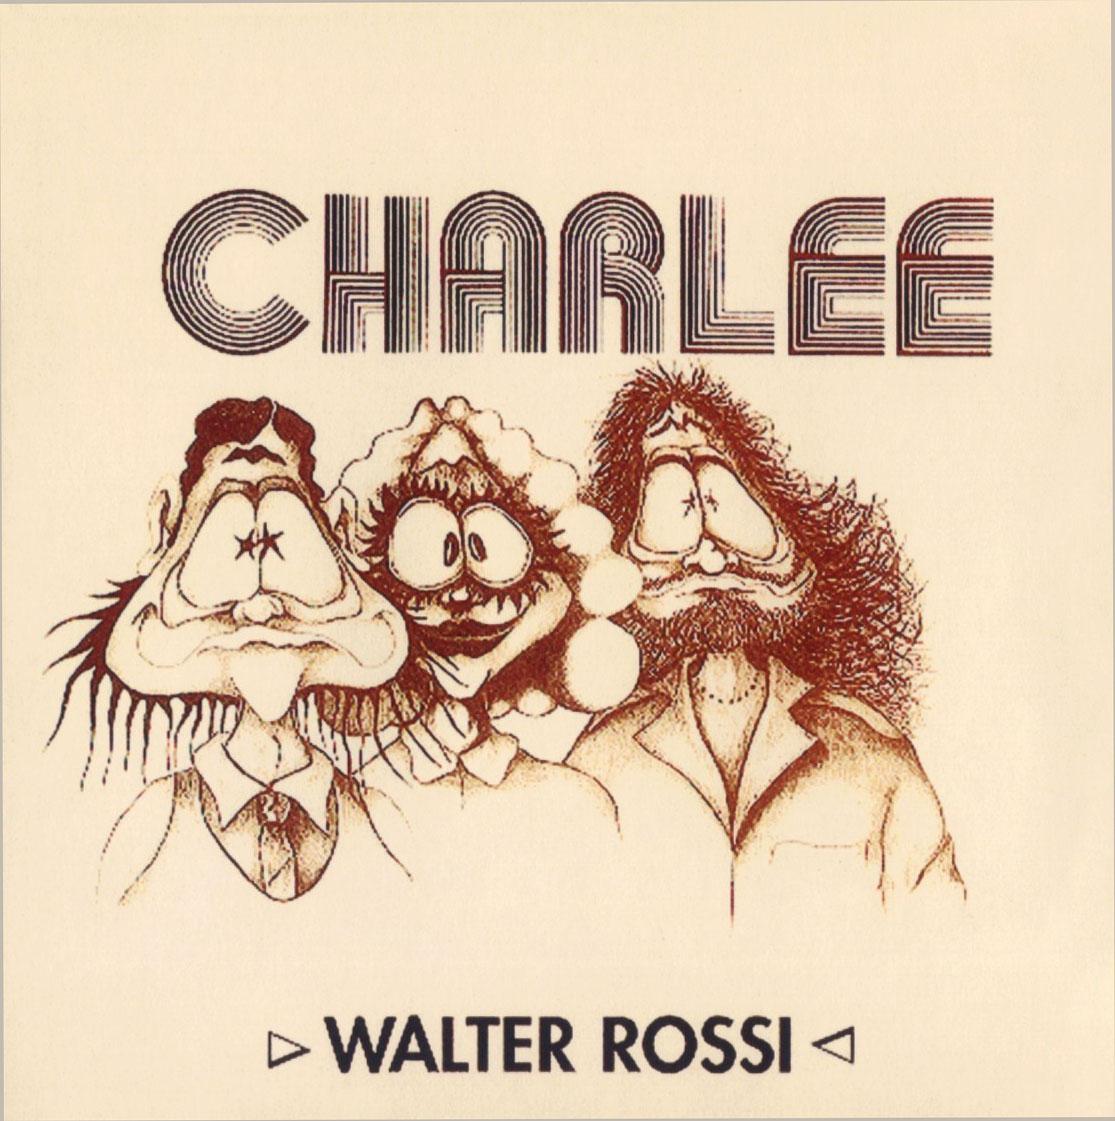 Walter Rossi - Wizzard